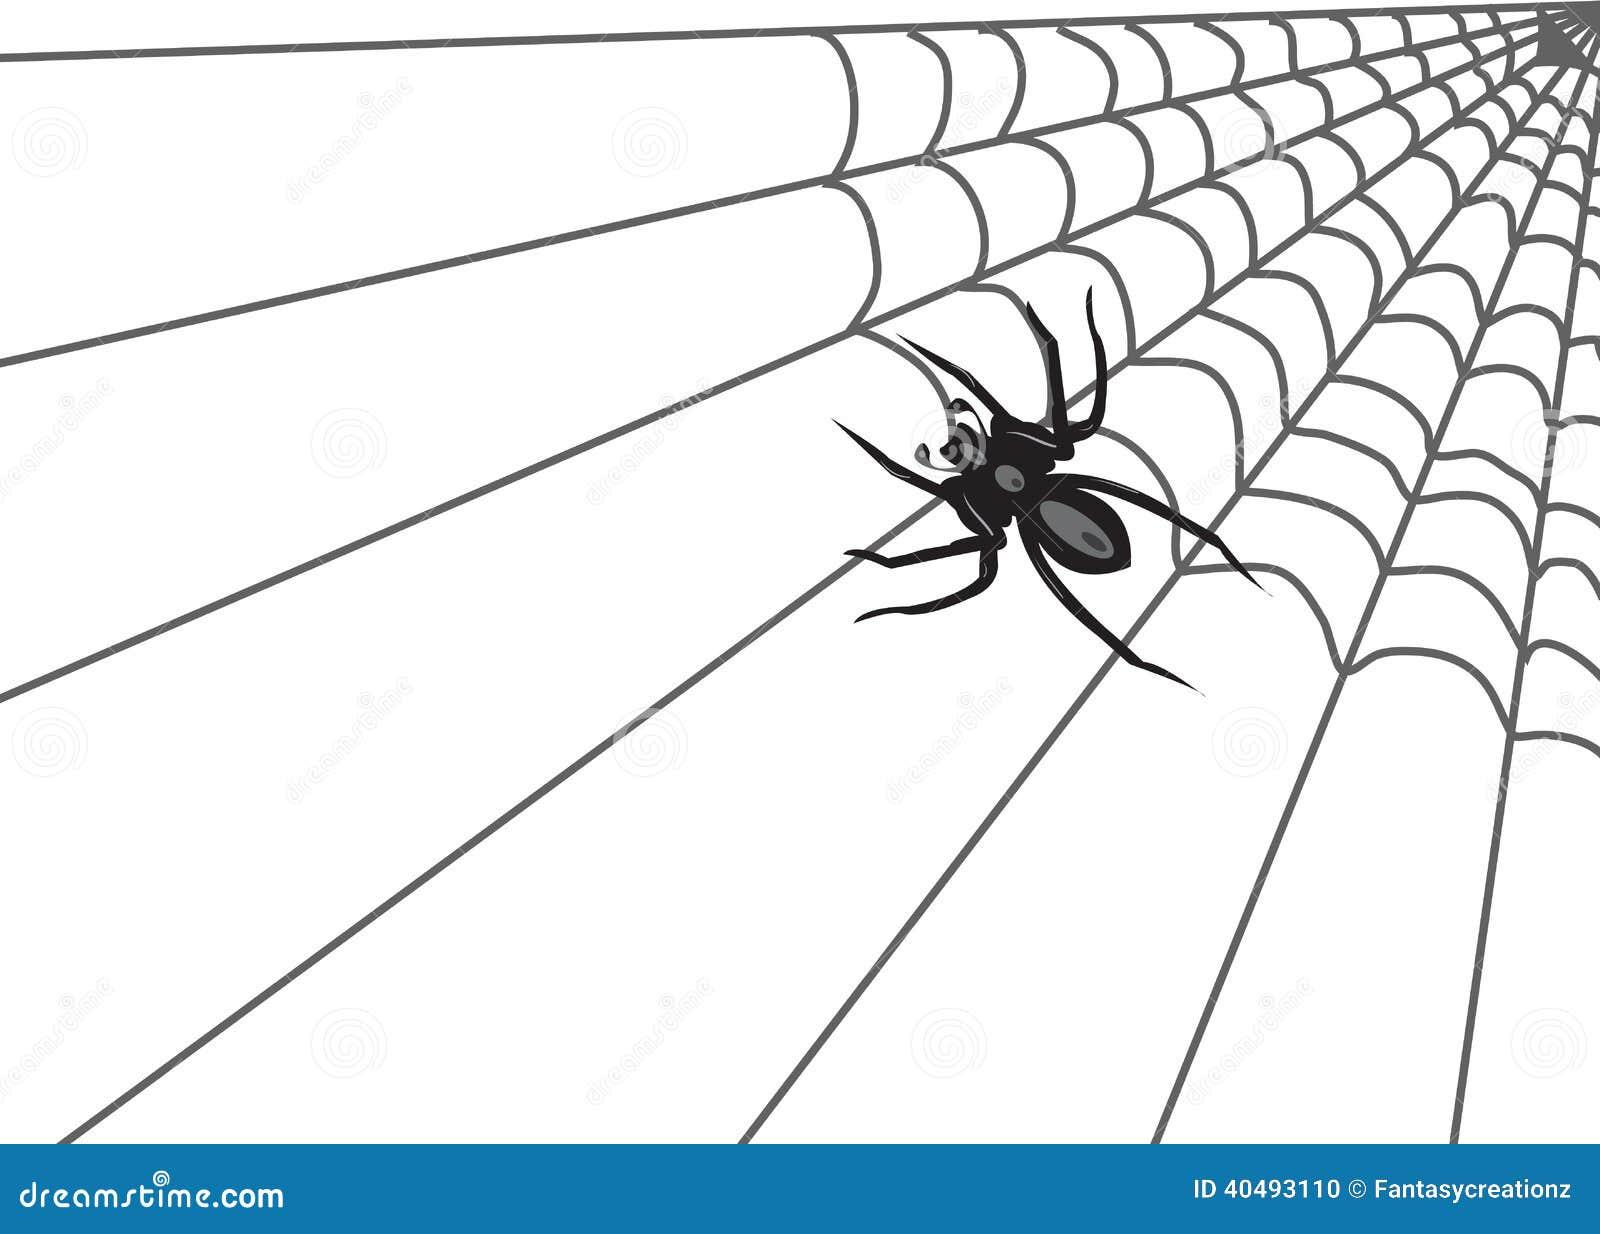 spider web stock vector